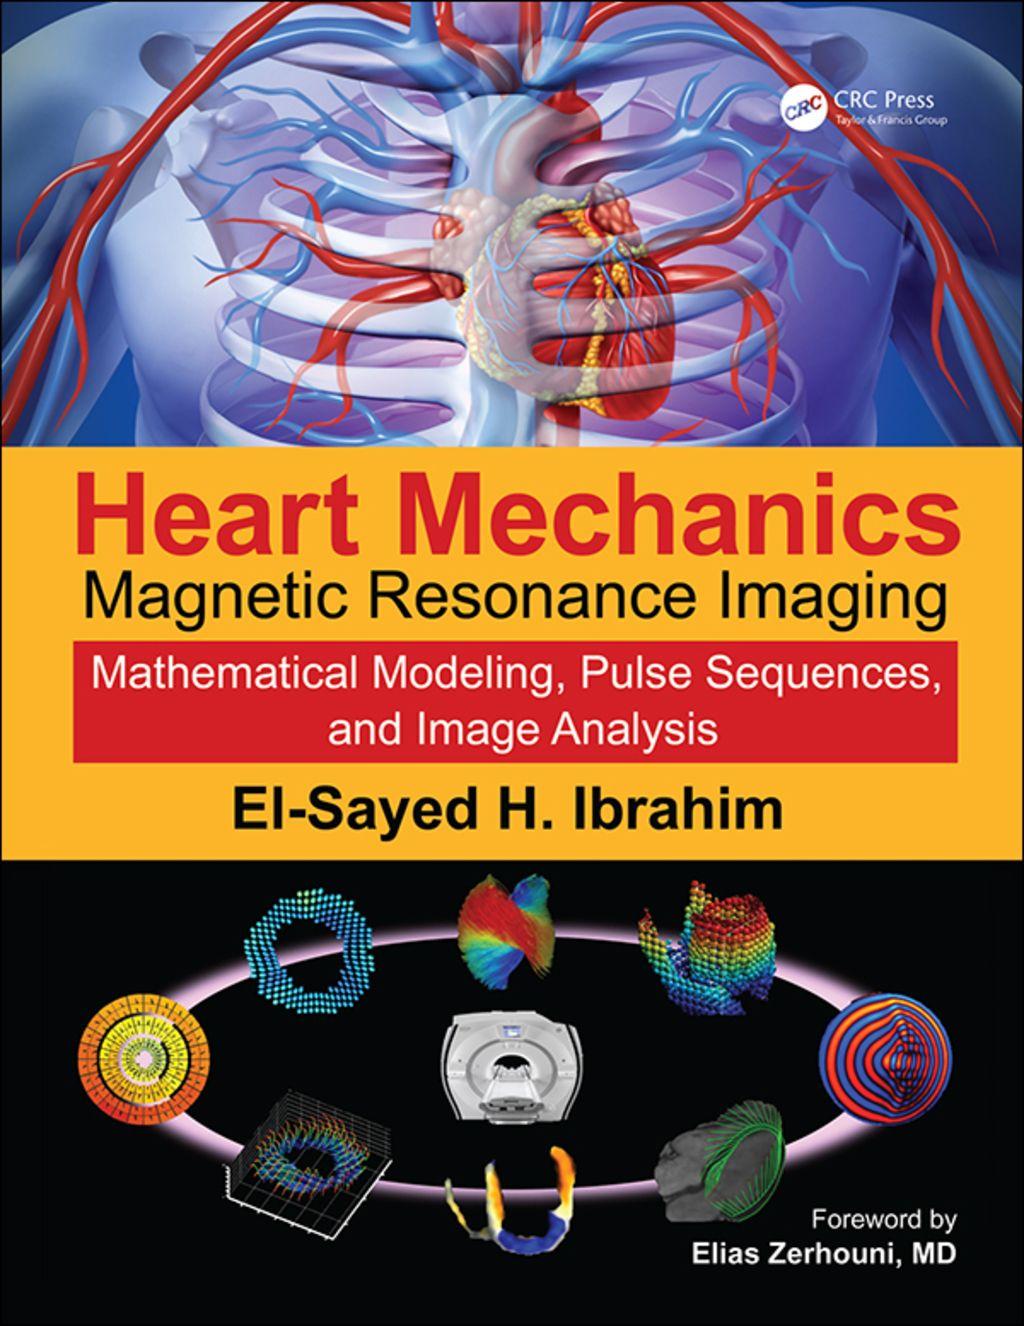 Heart mechanics ebook rental resonance